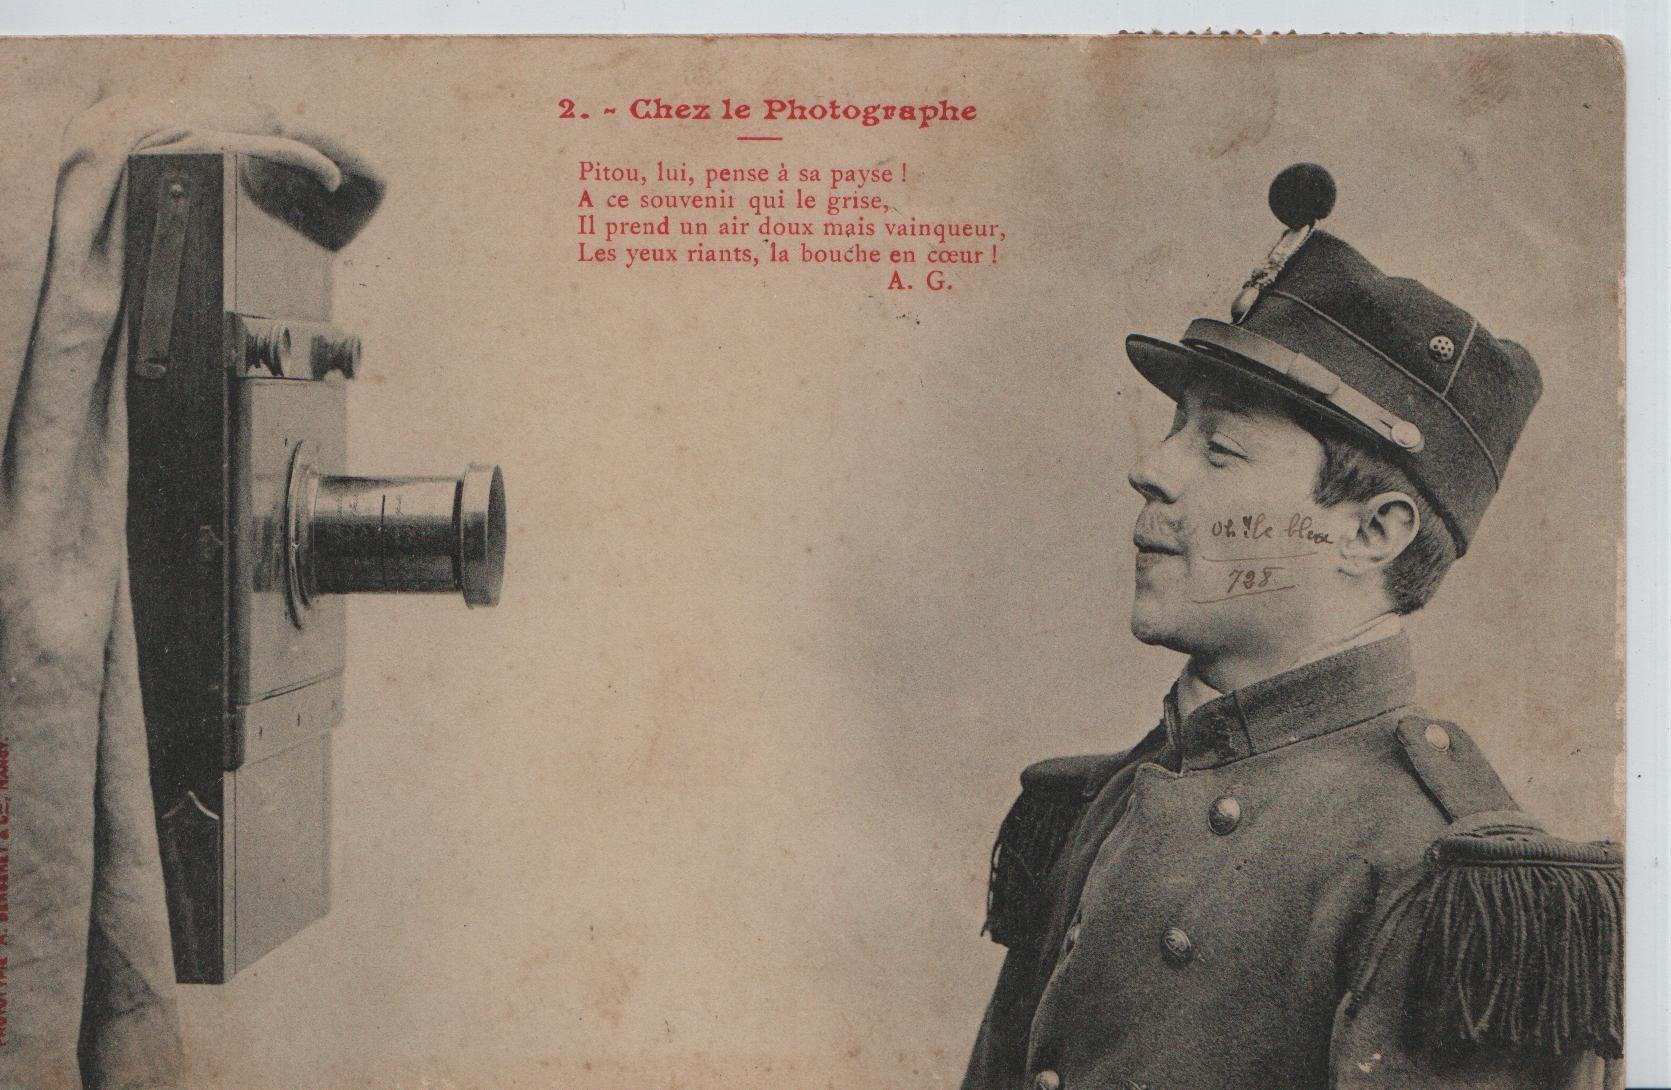 27. Aug 1905